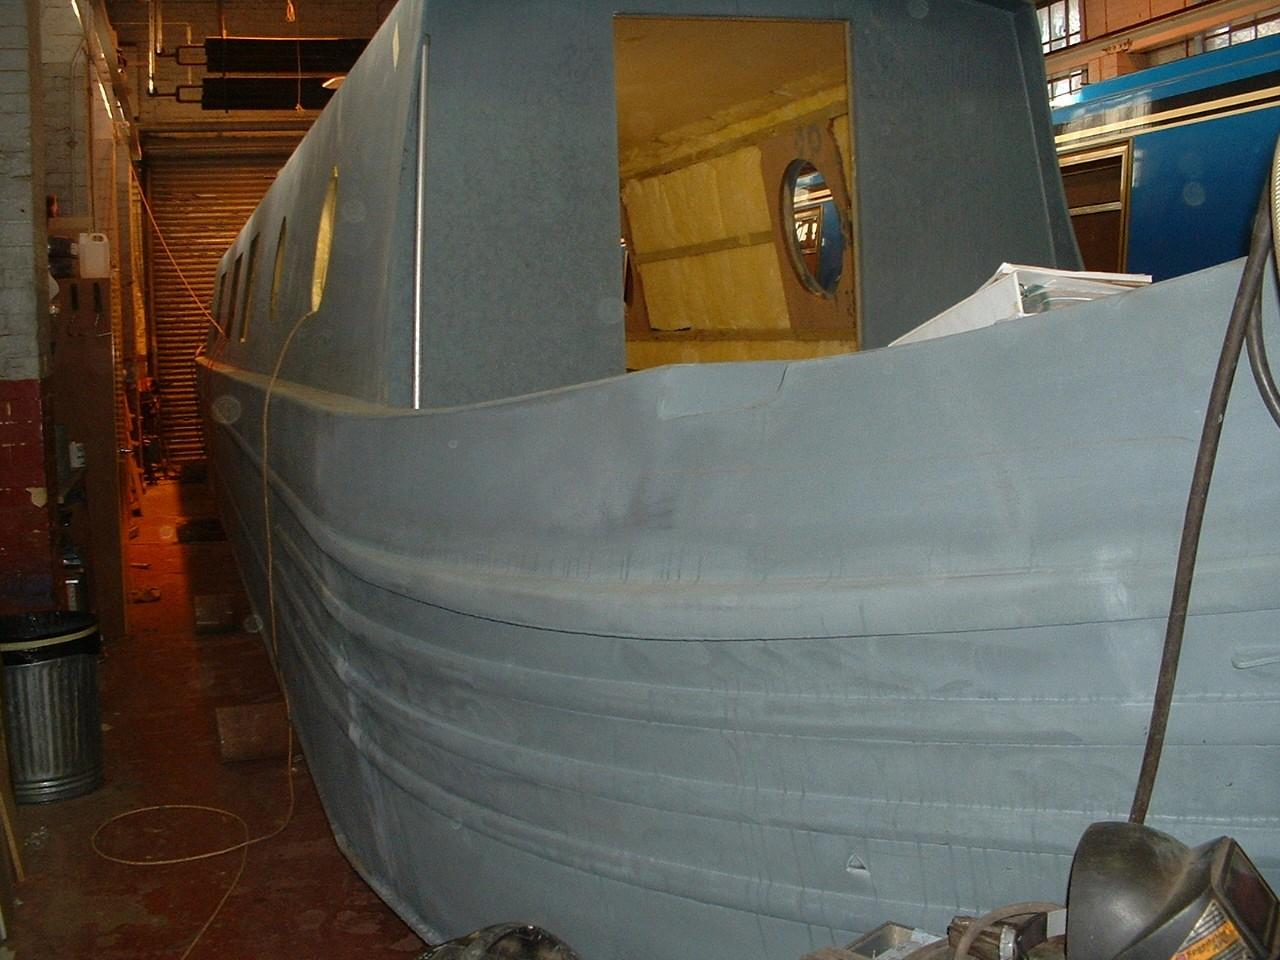 Kinglsground Narrow boat 2 - bow view